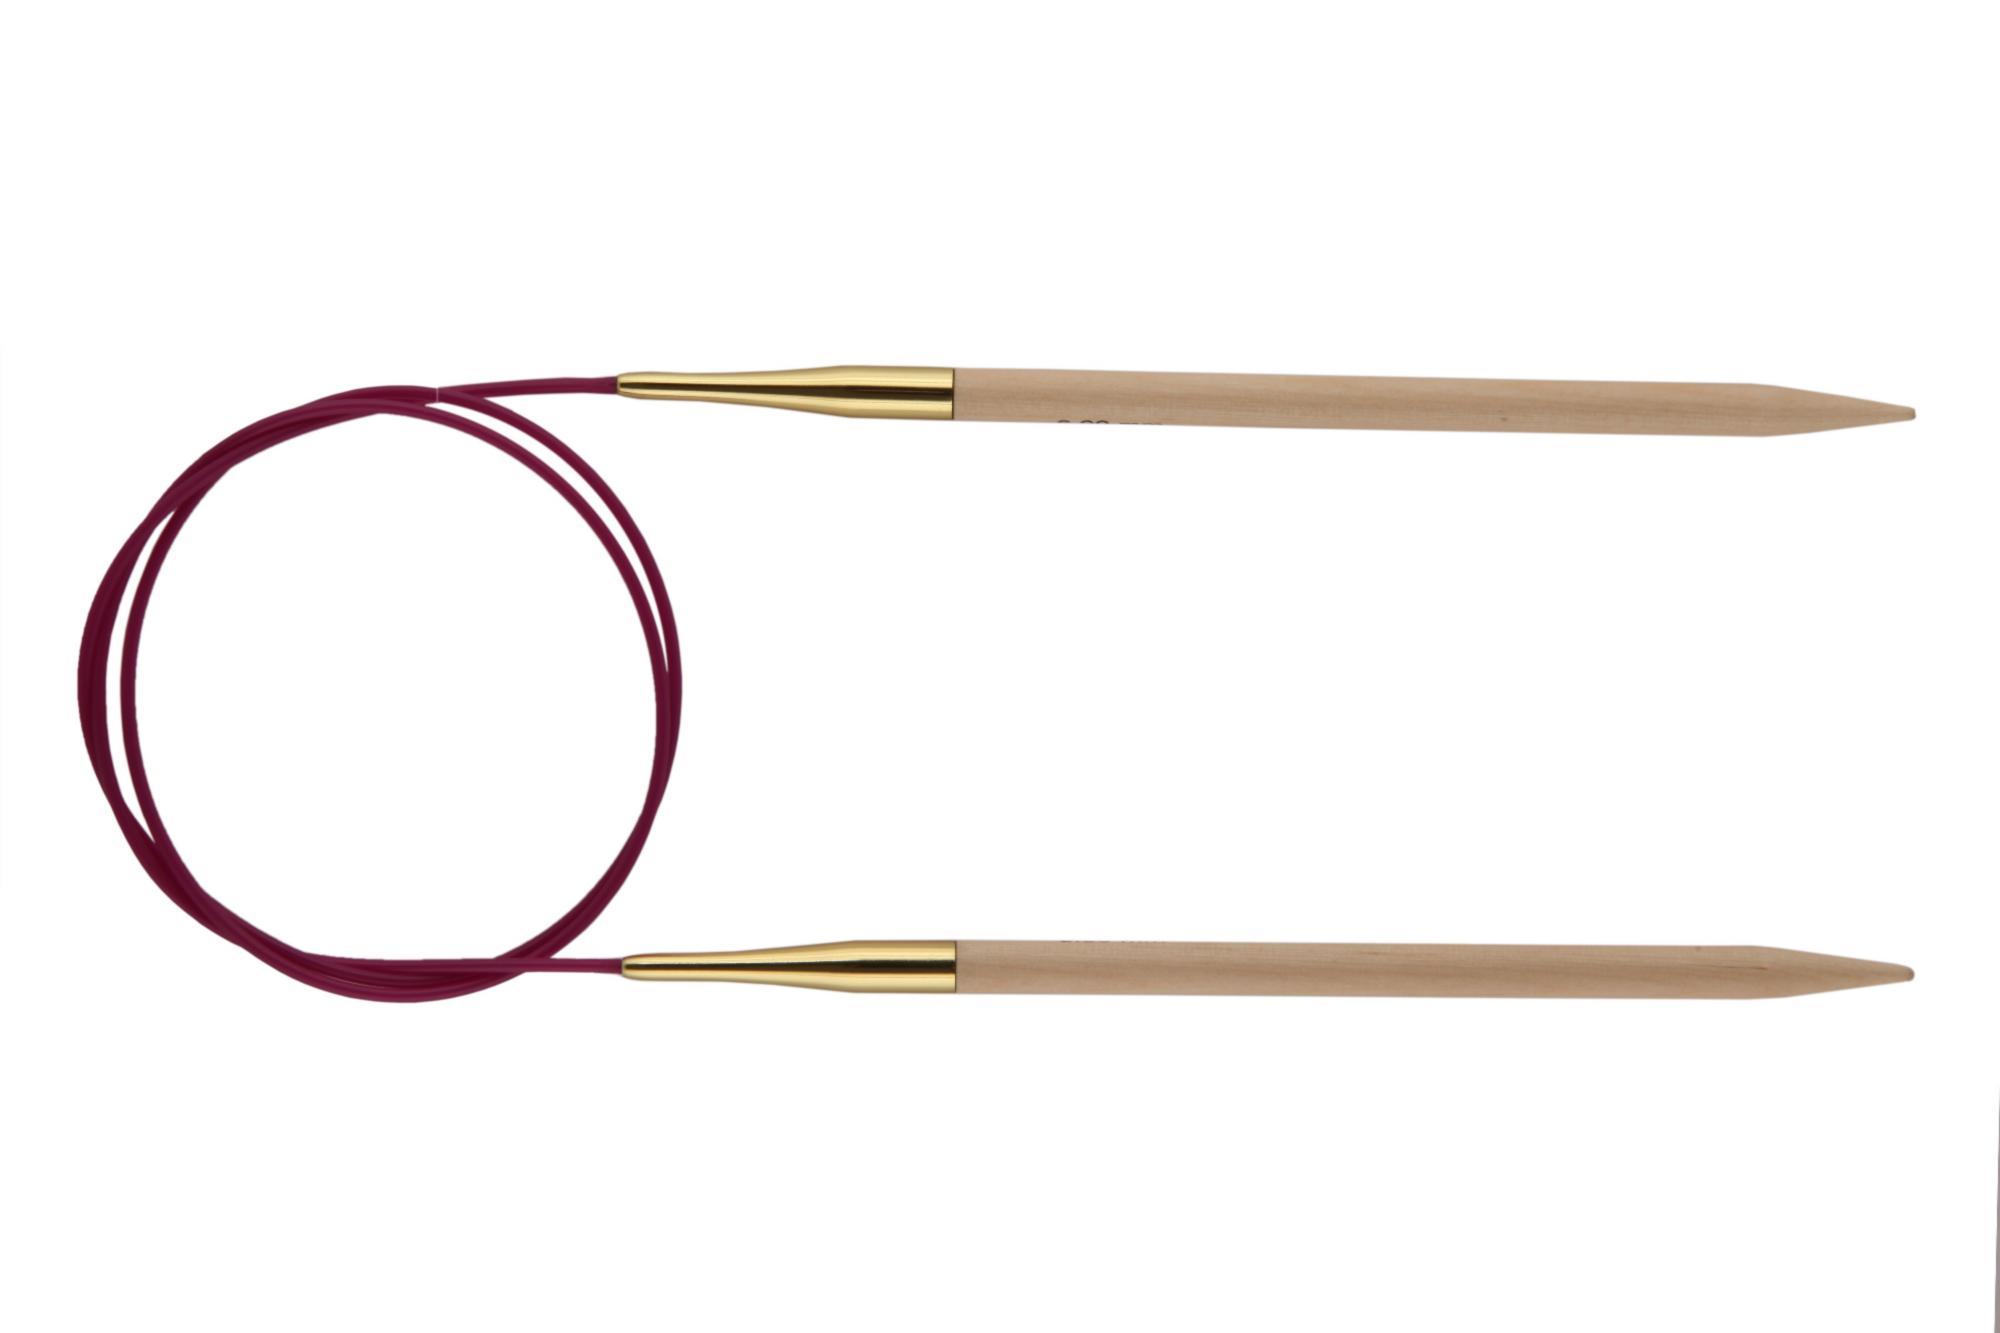 Спицы круговые 80 см Basix Birch Wood KnitPro, 35333, 6.50 мм